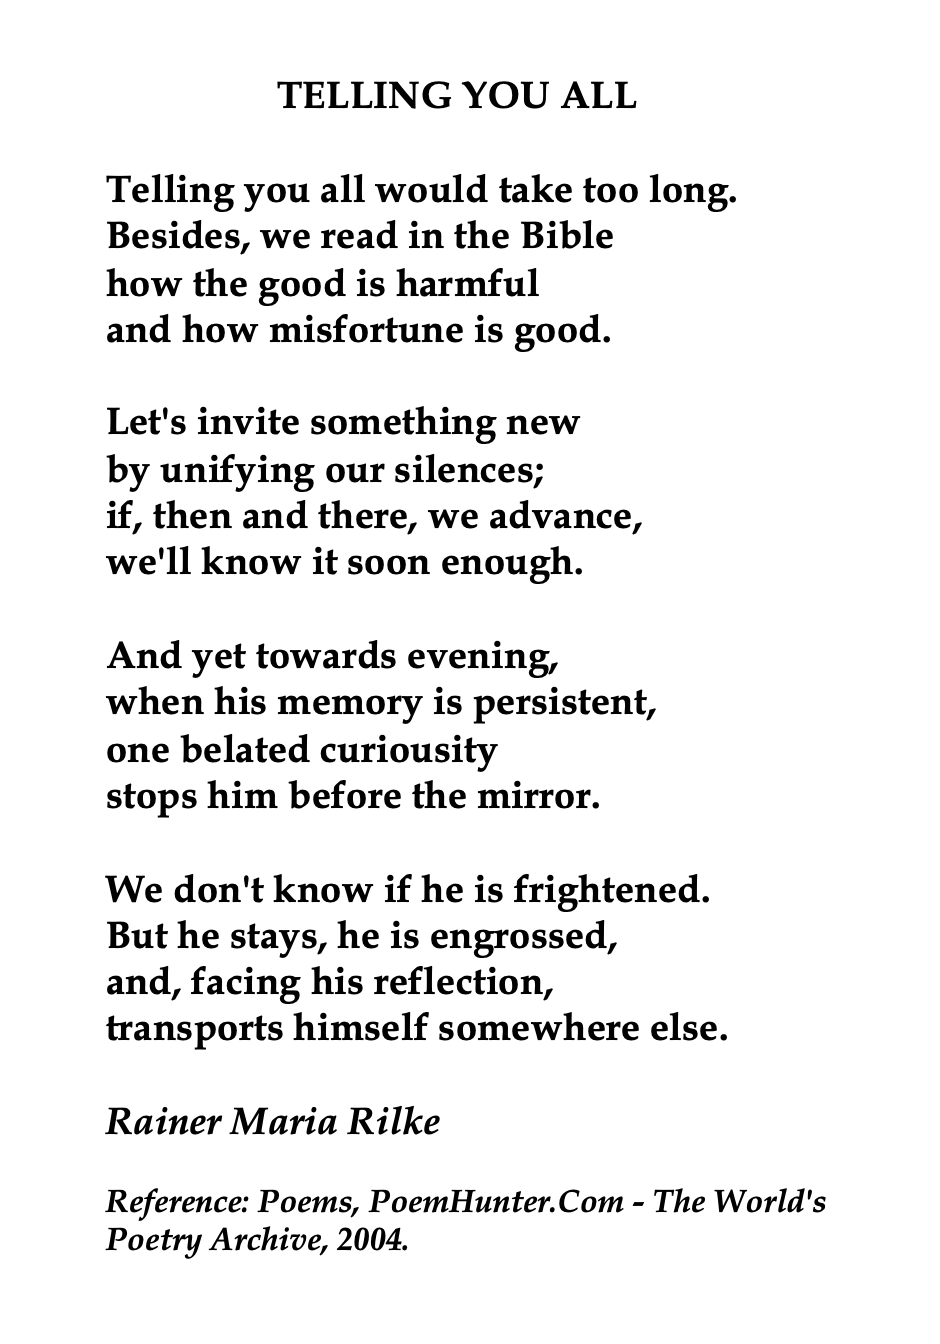 Rainer Maria Rilke Austrian German Poet Poem Quote Paraphrase Of The Mirror By Sylvia Plath